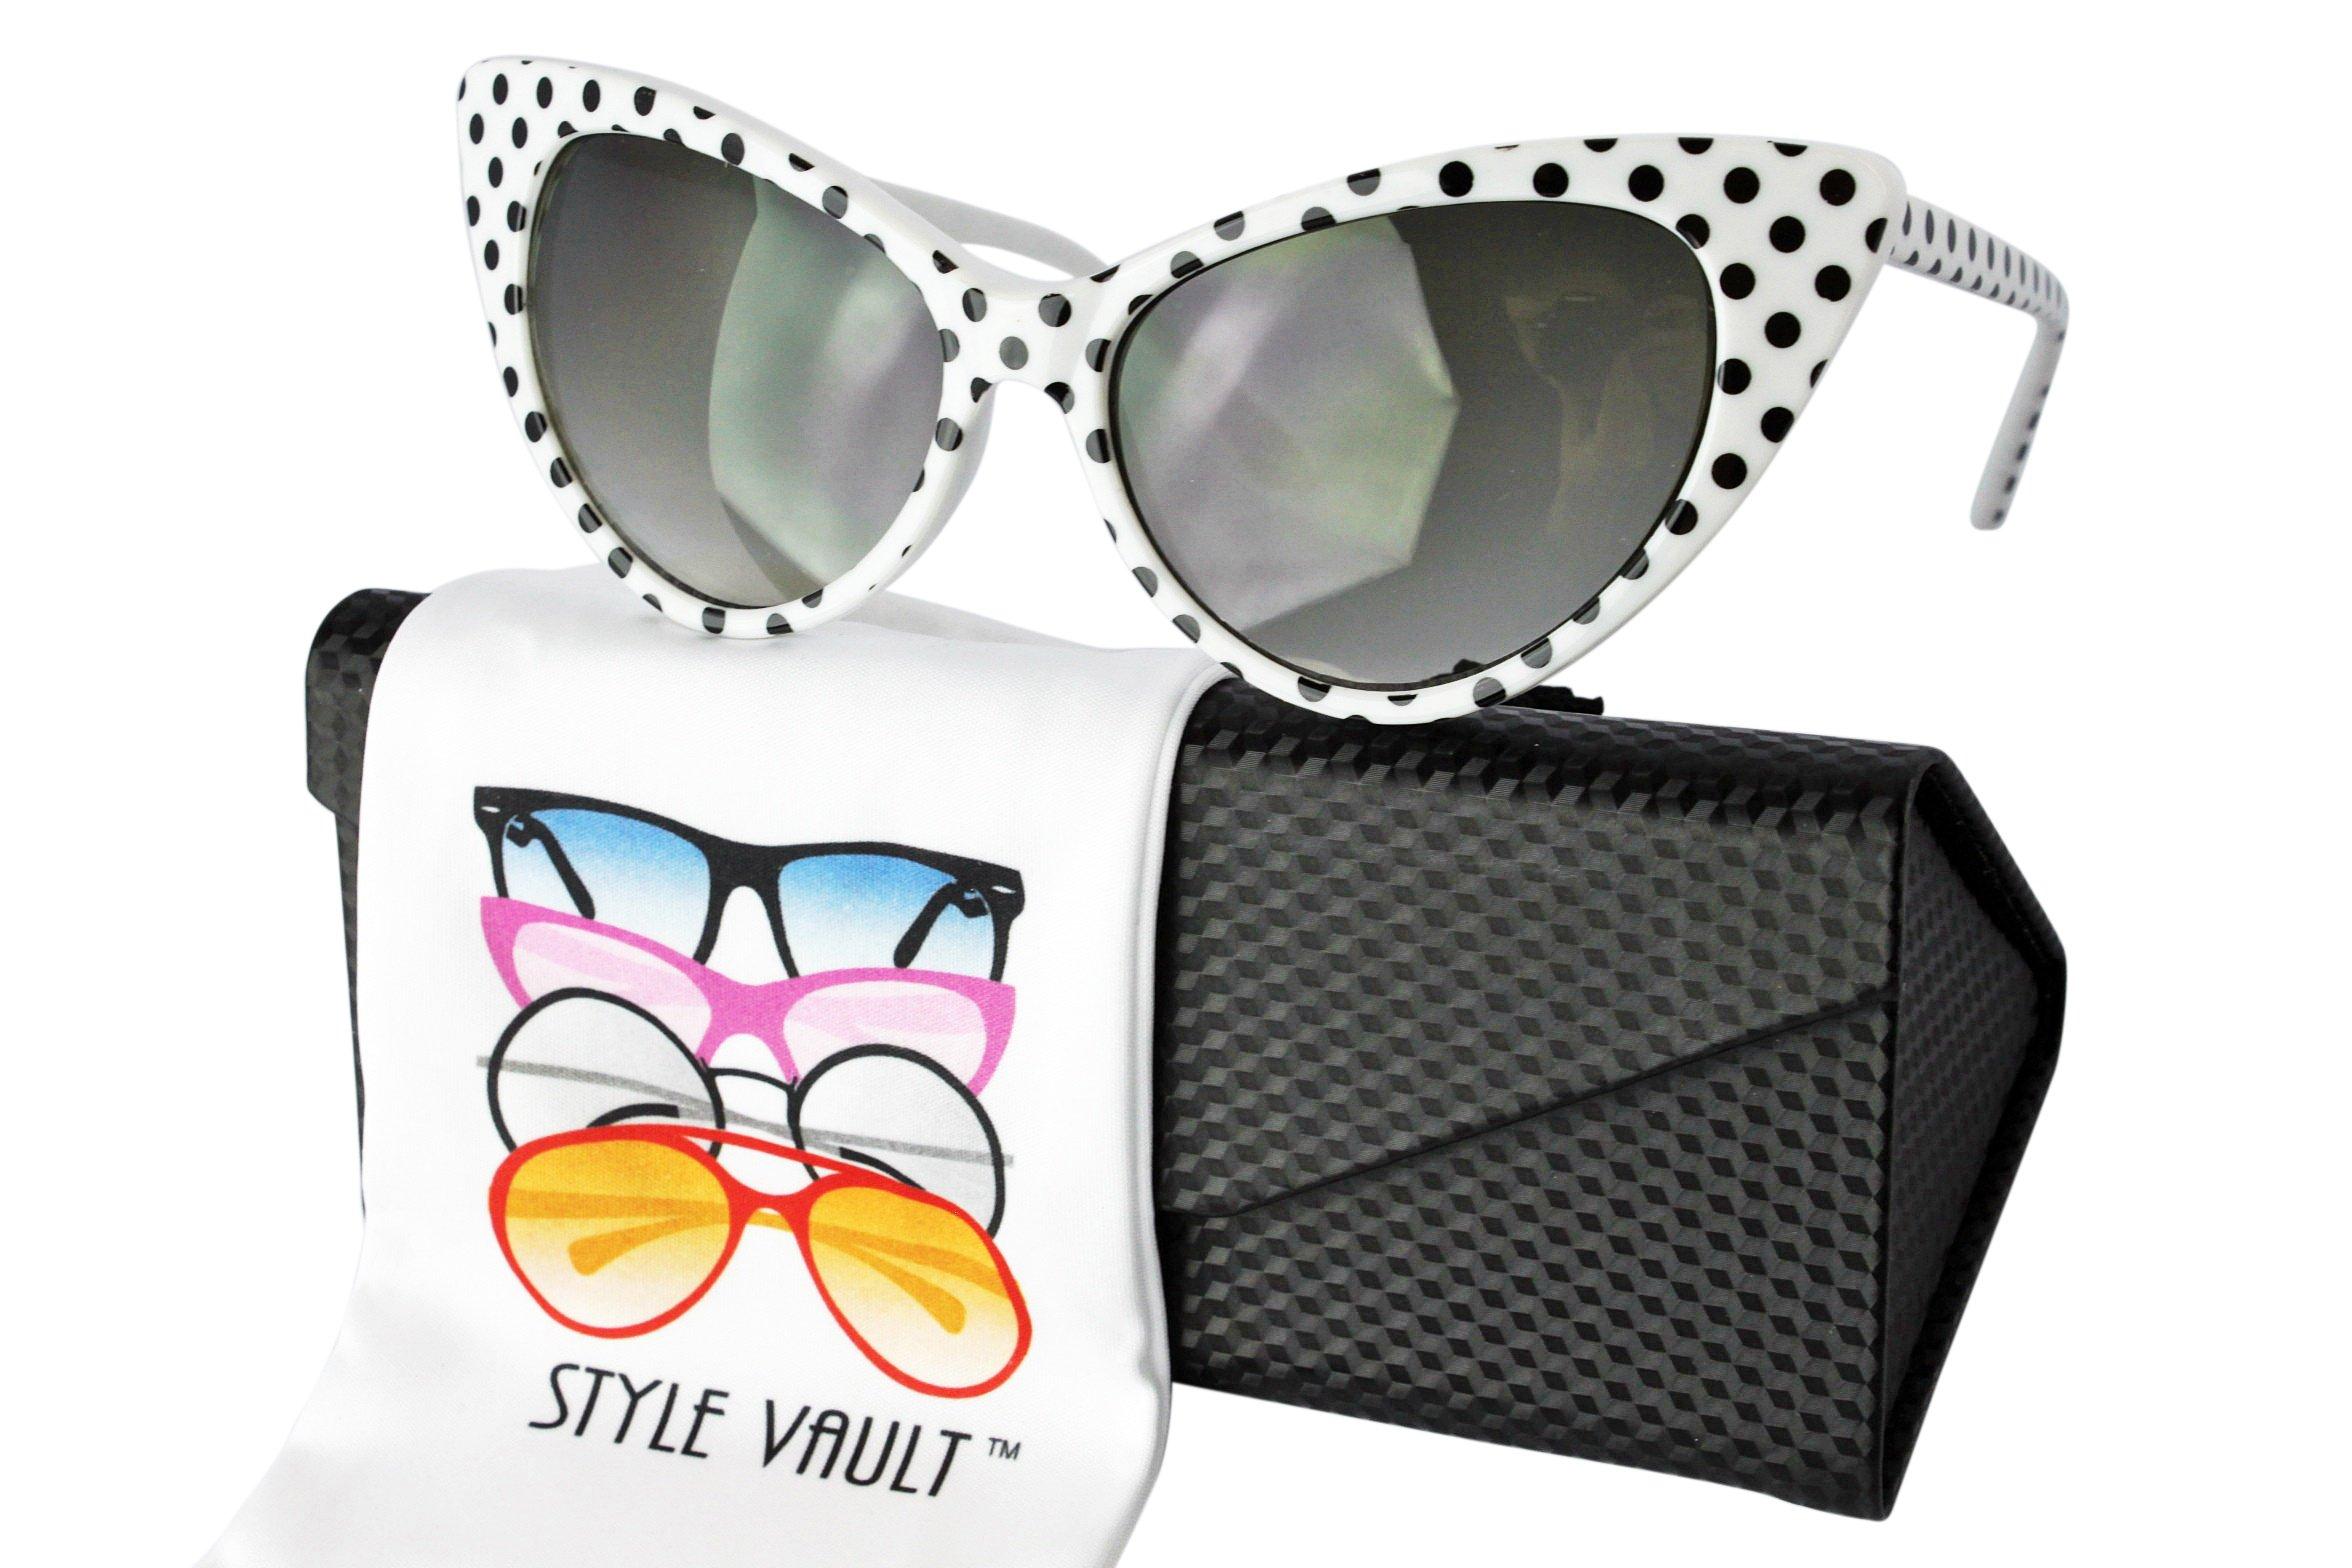 Wm508-ec Style Vault Cateye Sunglasses (S3235V Polka dots White w/case, uv400)